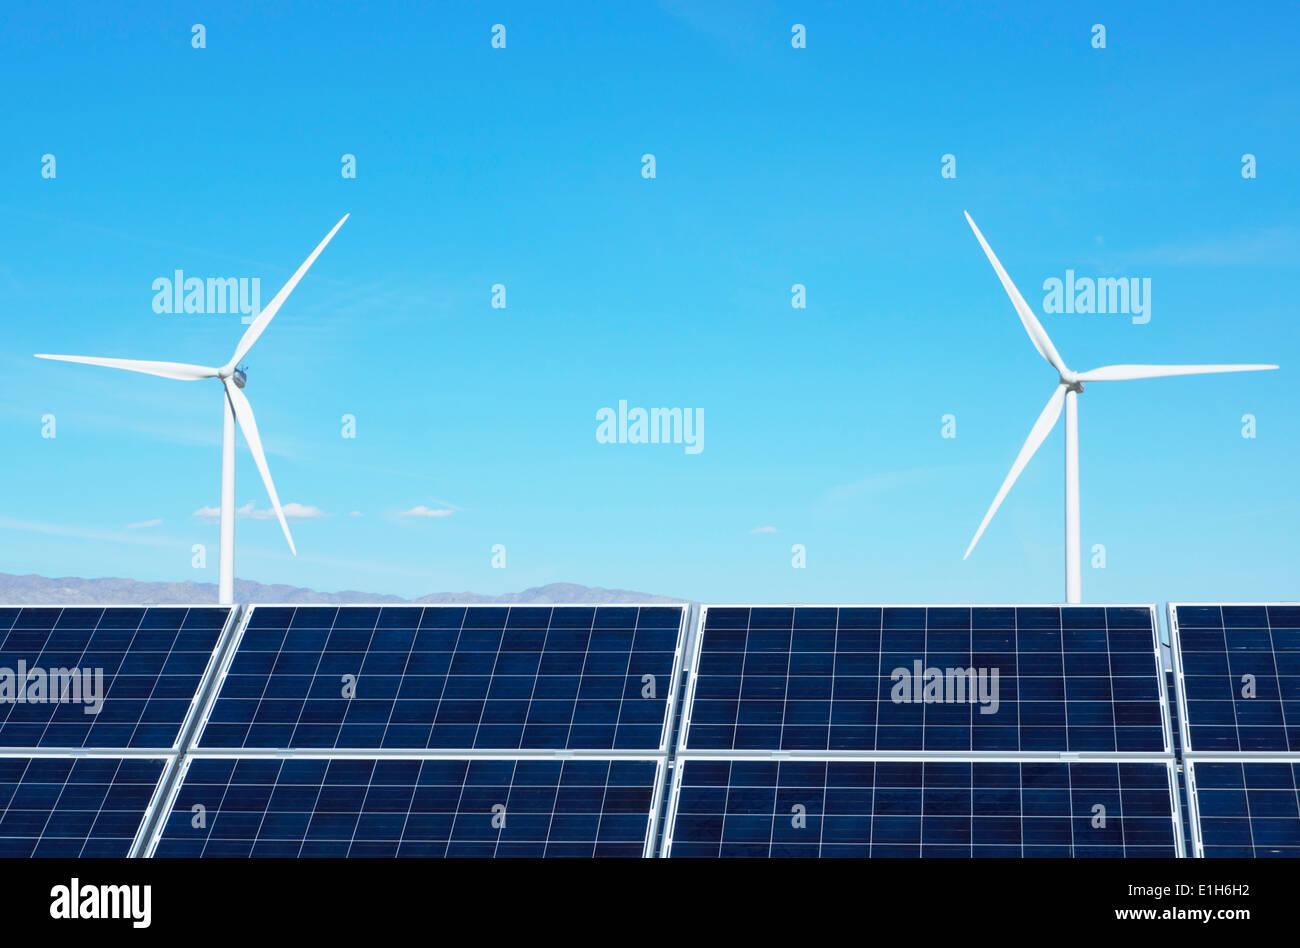 Photovoltaic solar panels and wind turbines, San Gorgonio Pass Wind Farm, Palm Springs, California, USA - Stock Image